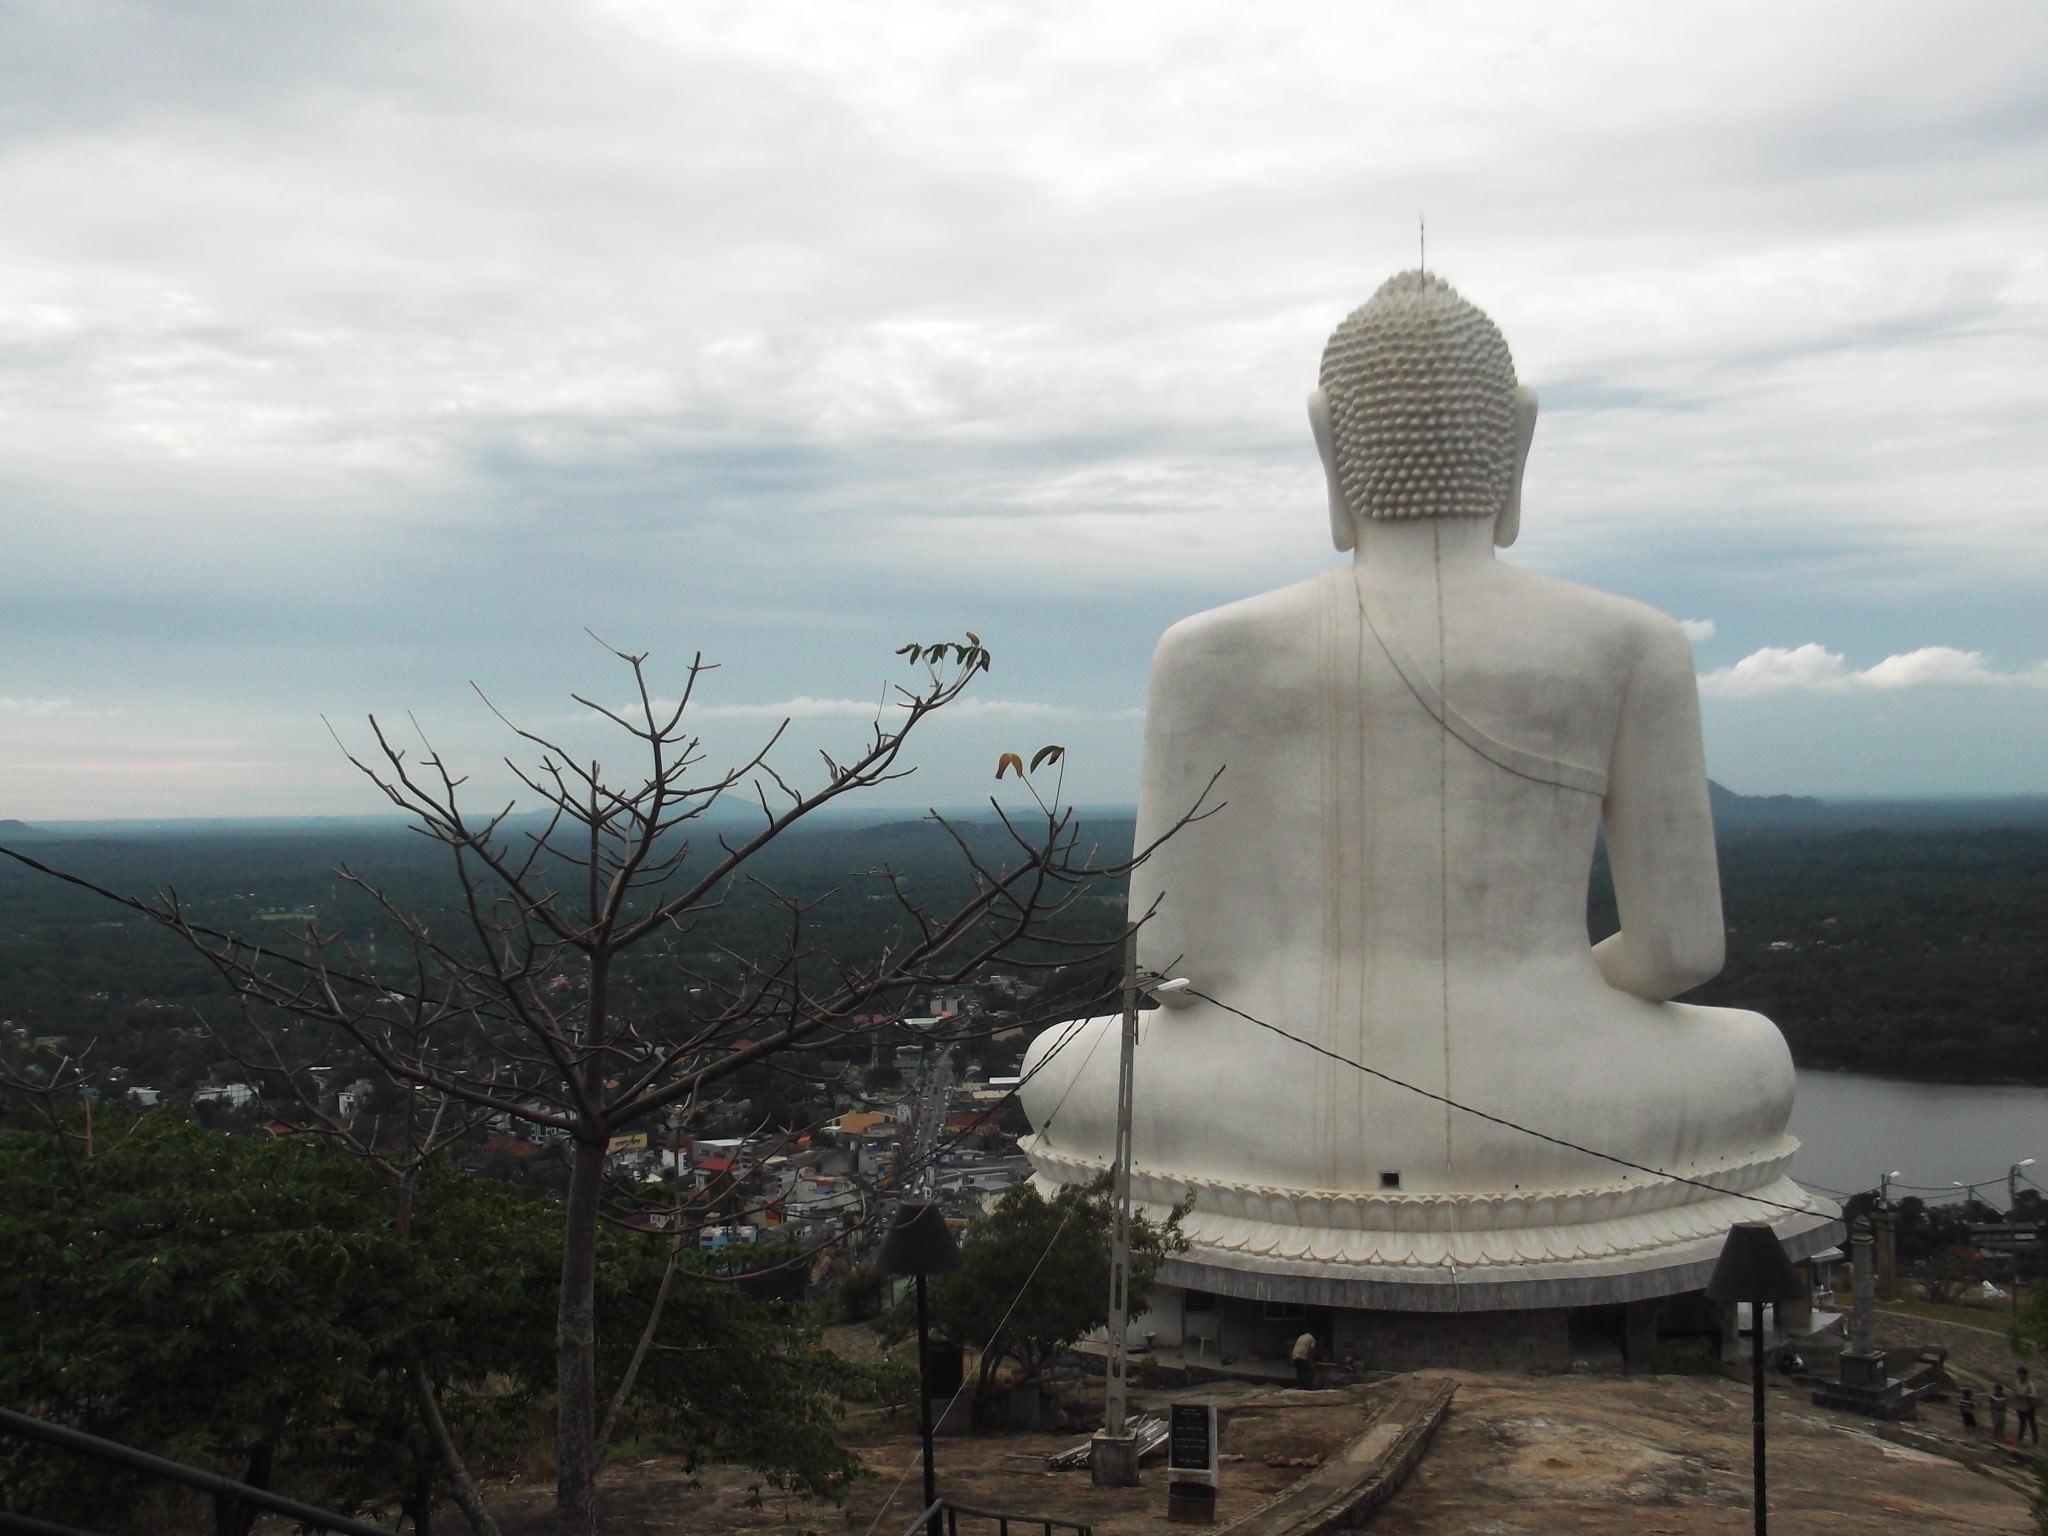 Things to see and do in Kurunegala Sri Lanka